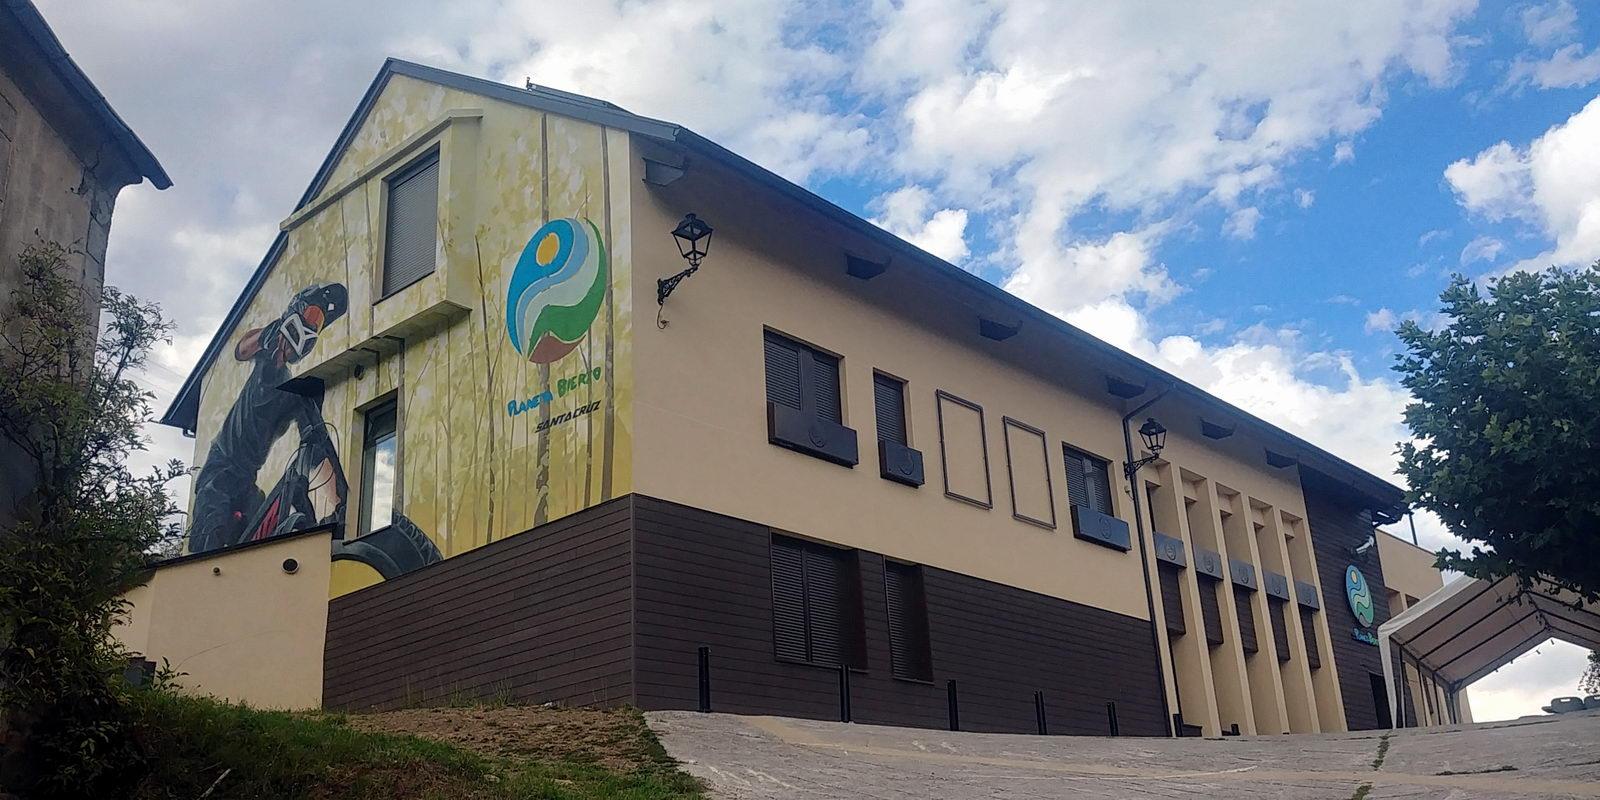 Centro MTB Planeta Bierzo | Alojamiento Bike Friendly